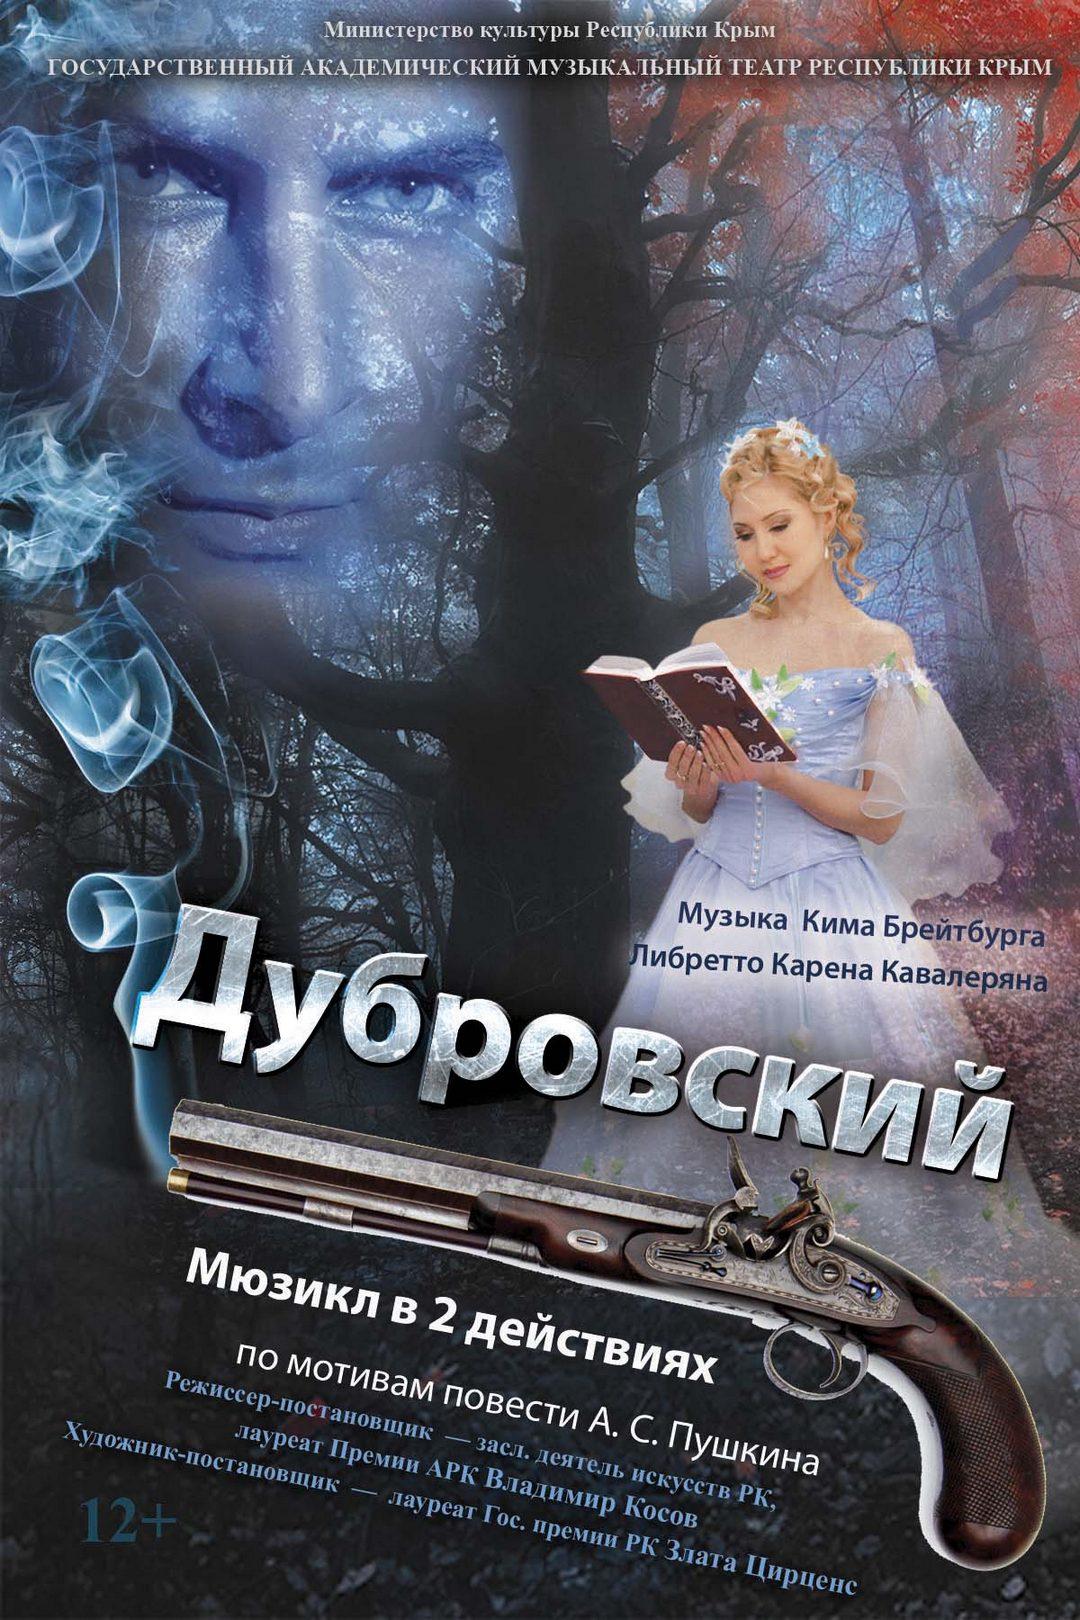 Афиша музыкального театра краснодар афиша кино днепра